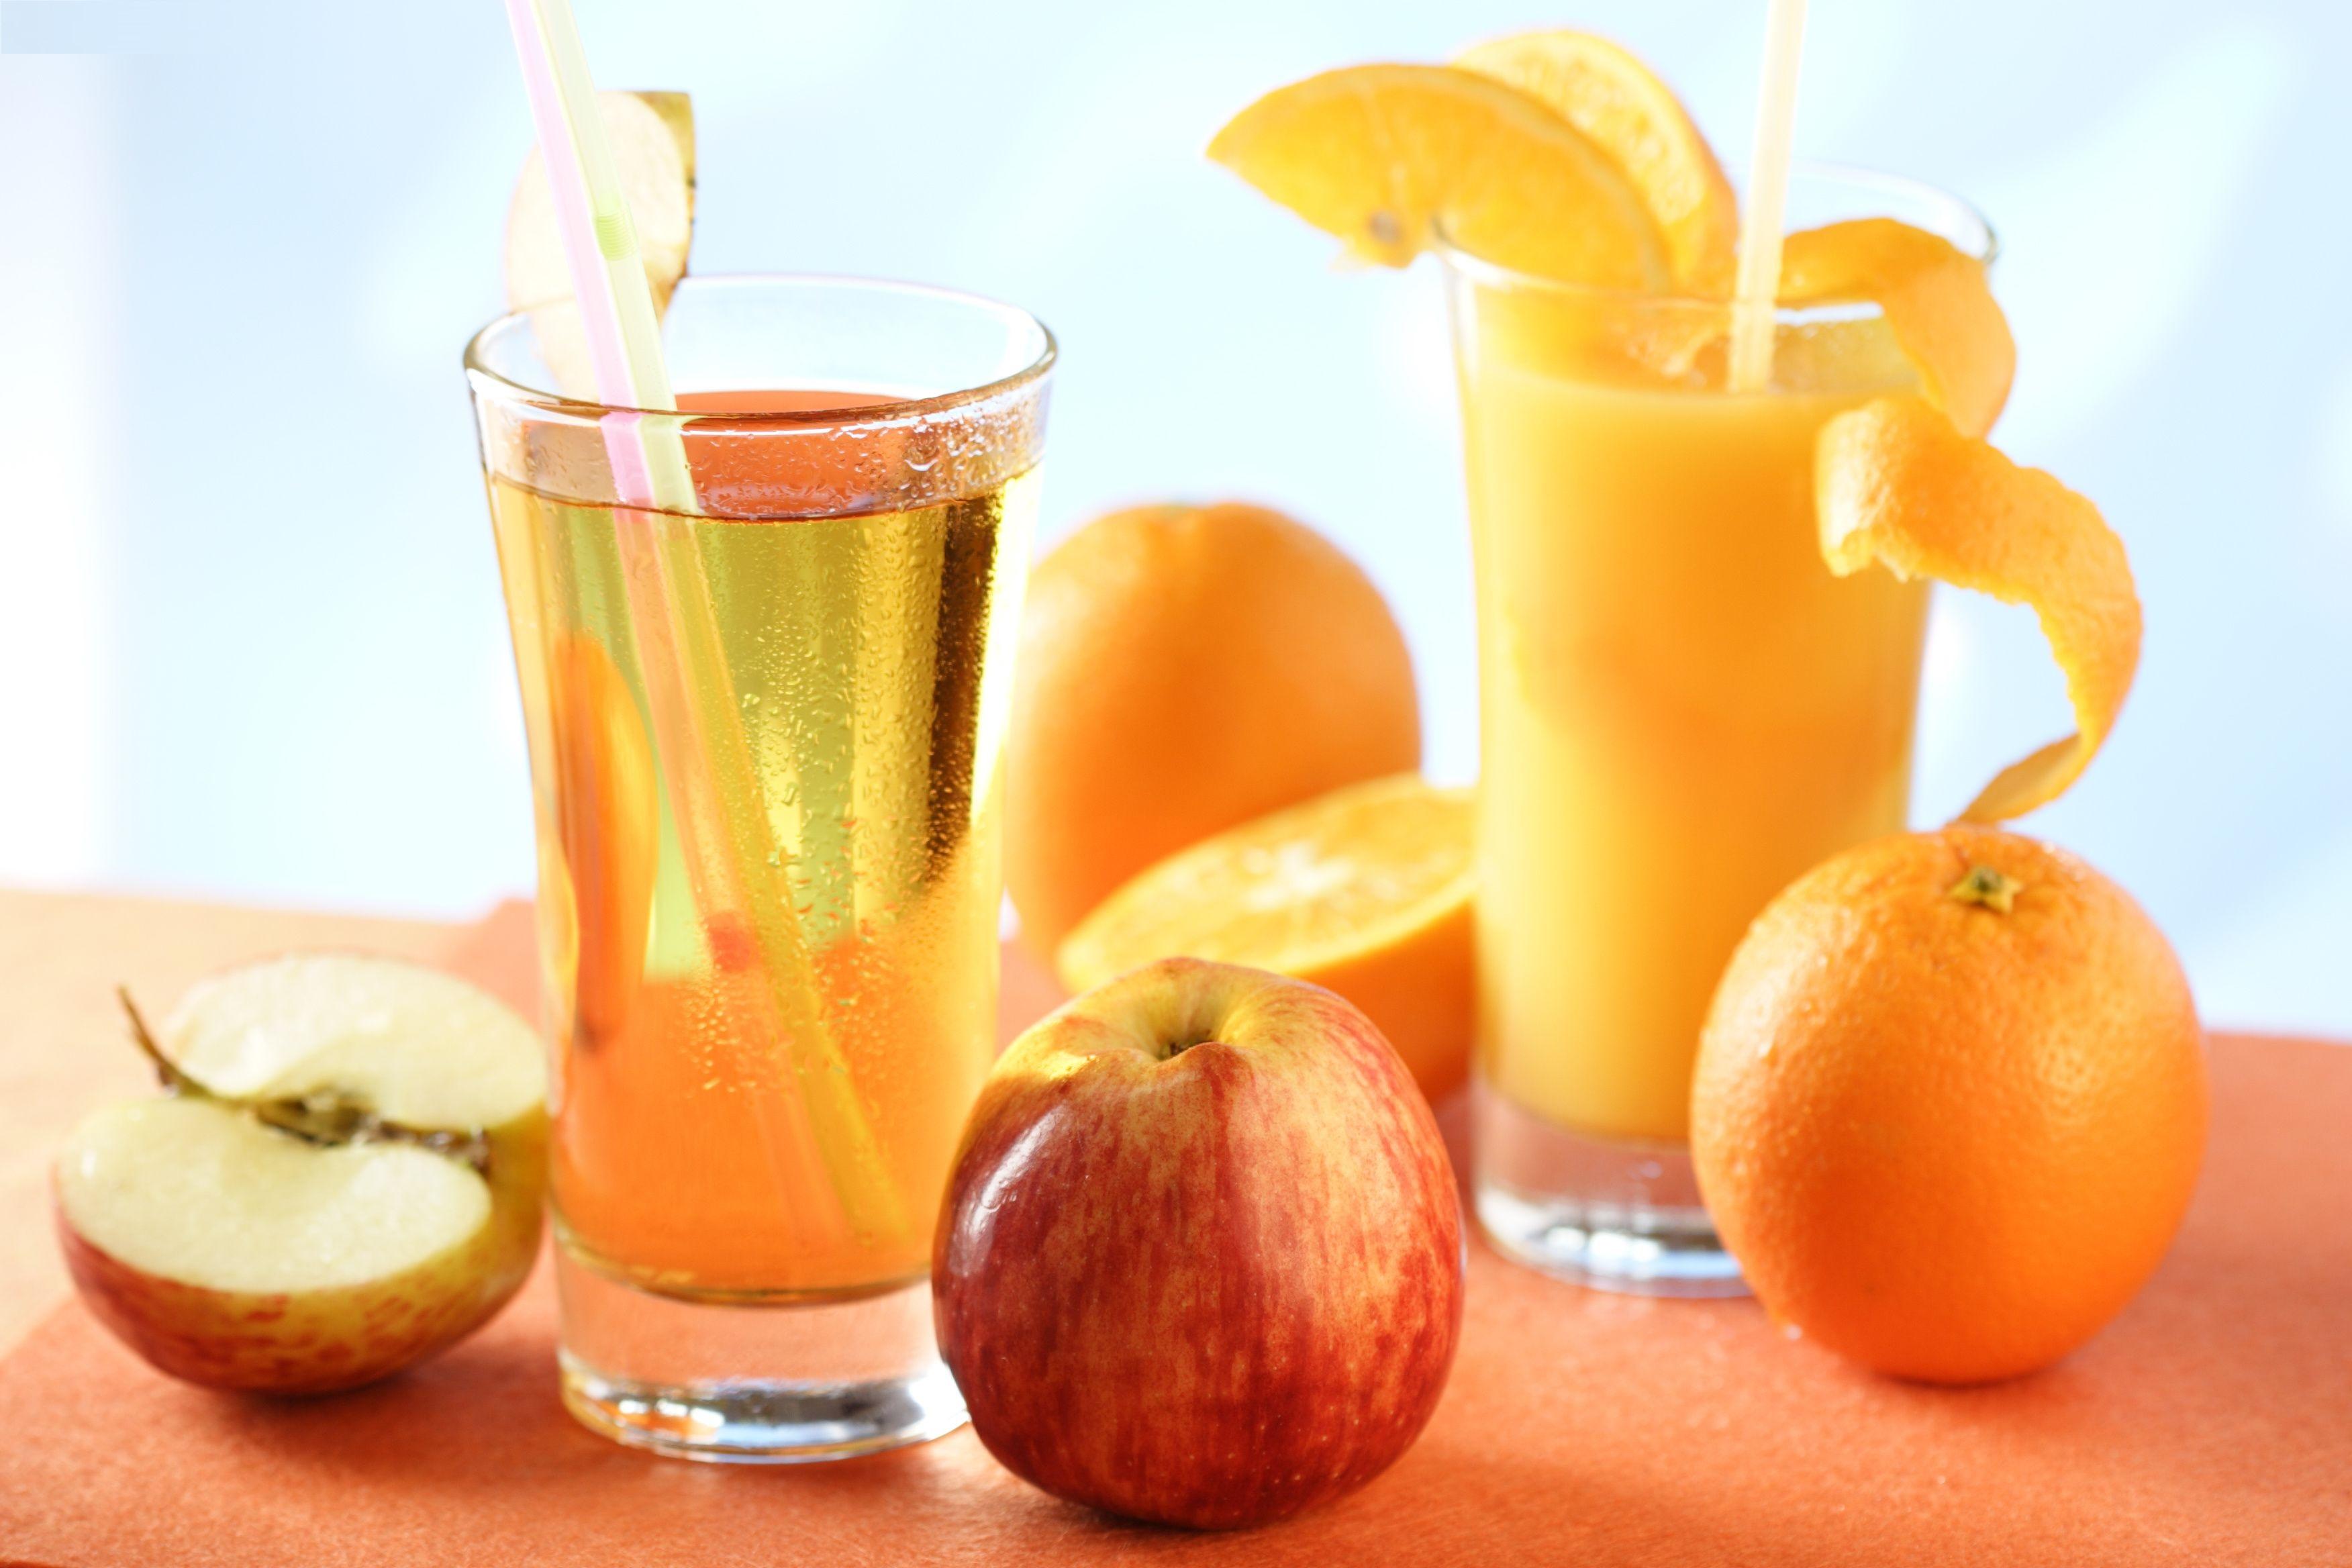 bebidas-jugo-naranja-manzan